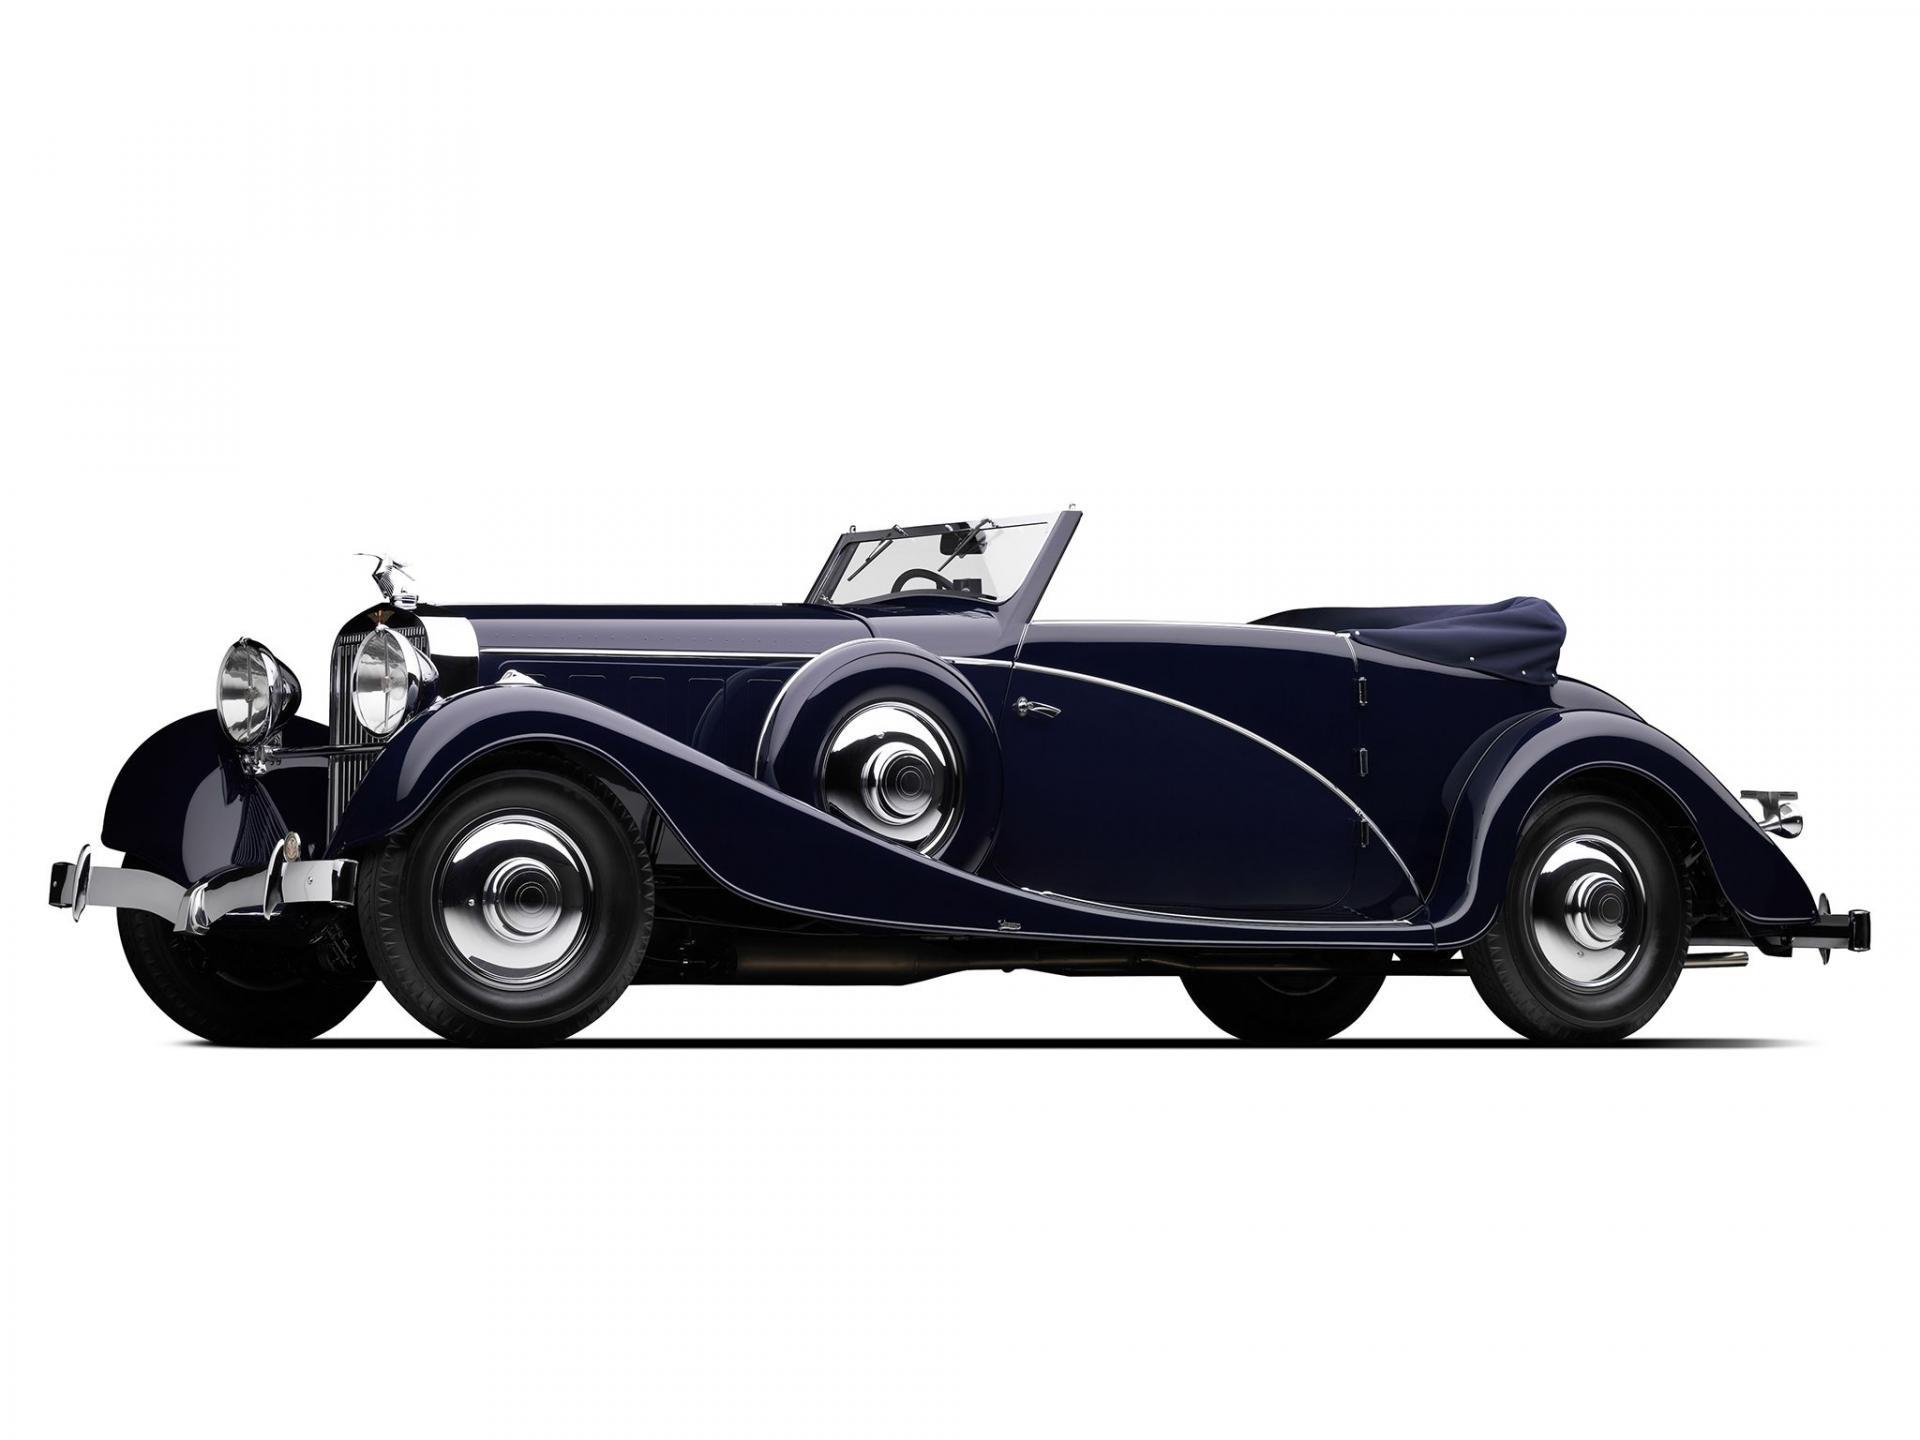 1934 Hispano Suiza J12 Vanvooren Cabriolet